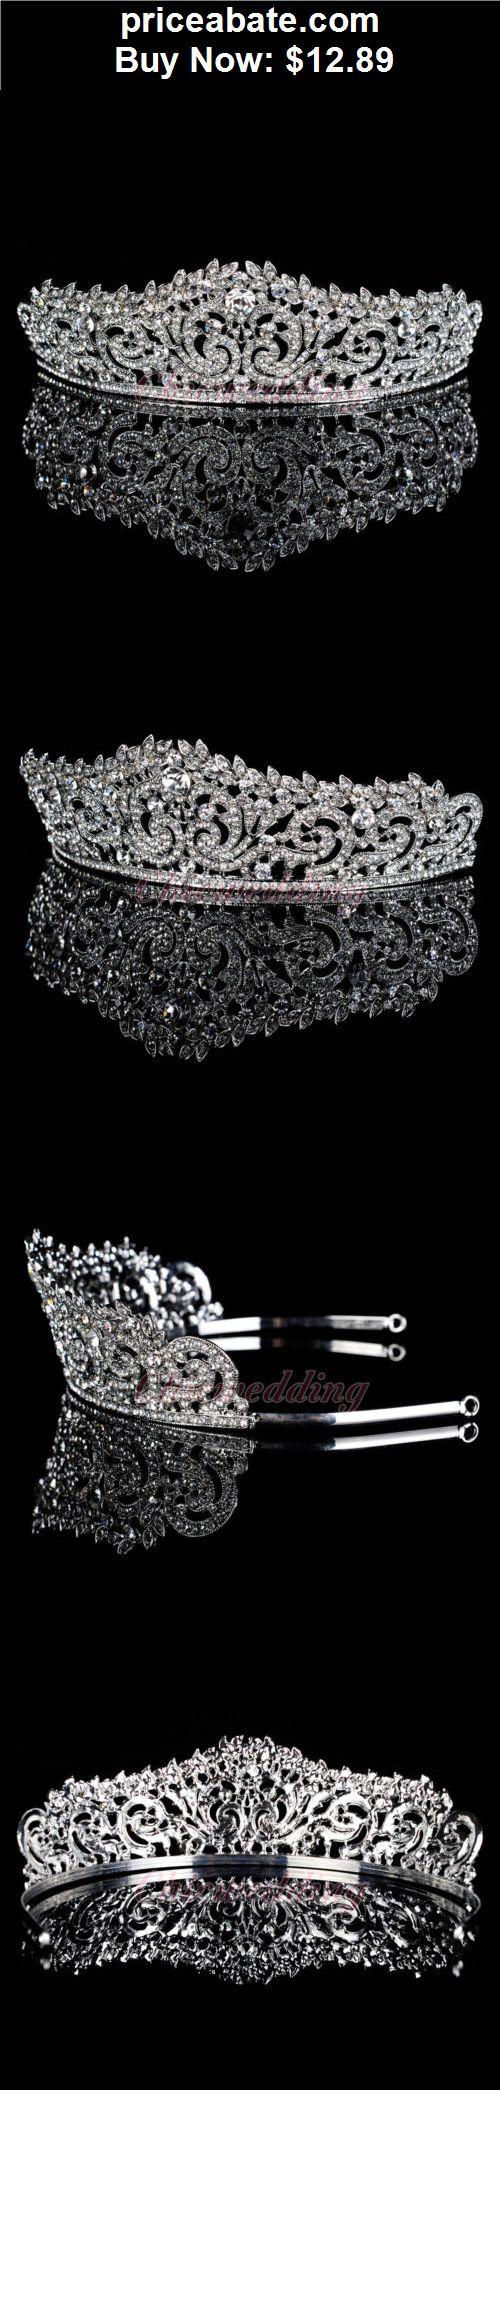 Bridal-Accessories: Elegant Crystal Tiara Wedding Bridal Floret Diamante Crown Headband Hair Jewelry - BUY IT NOW ONLY $12.89